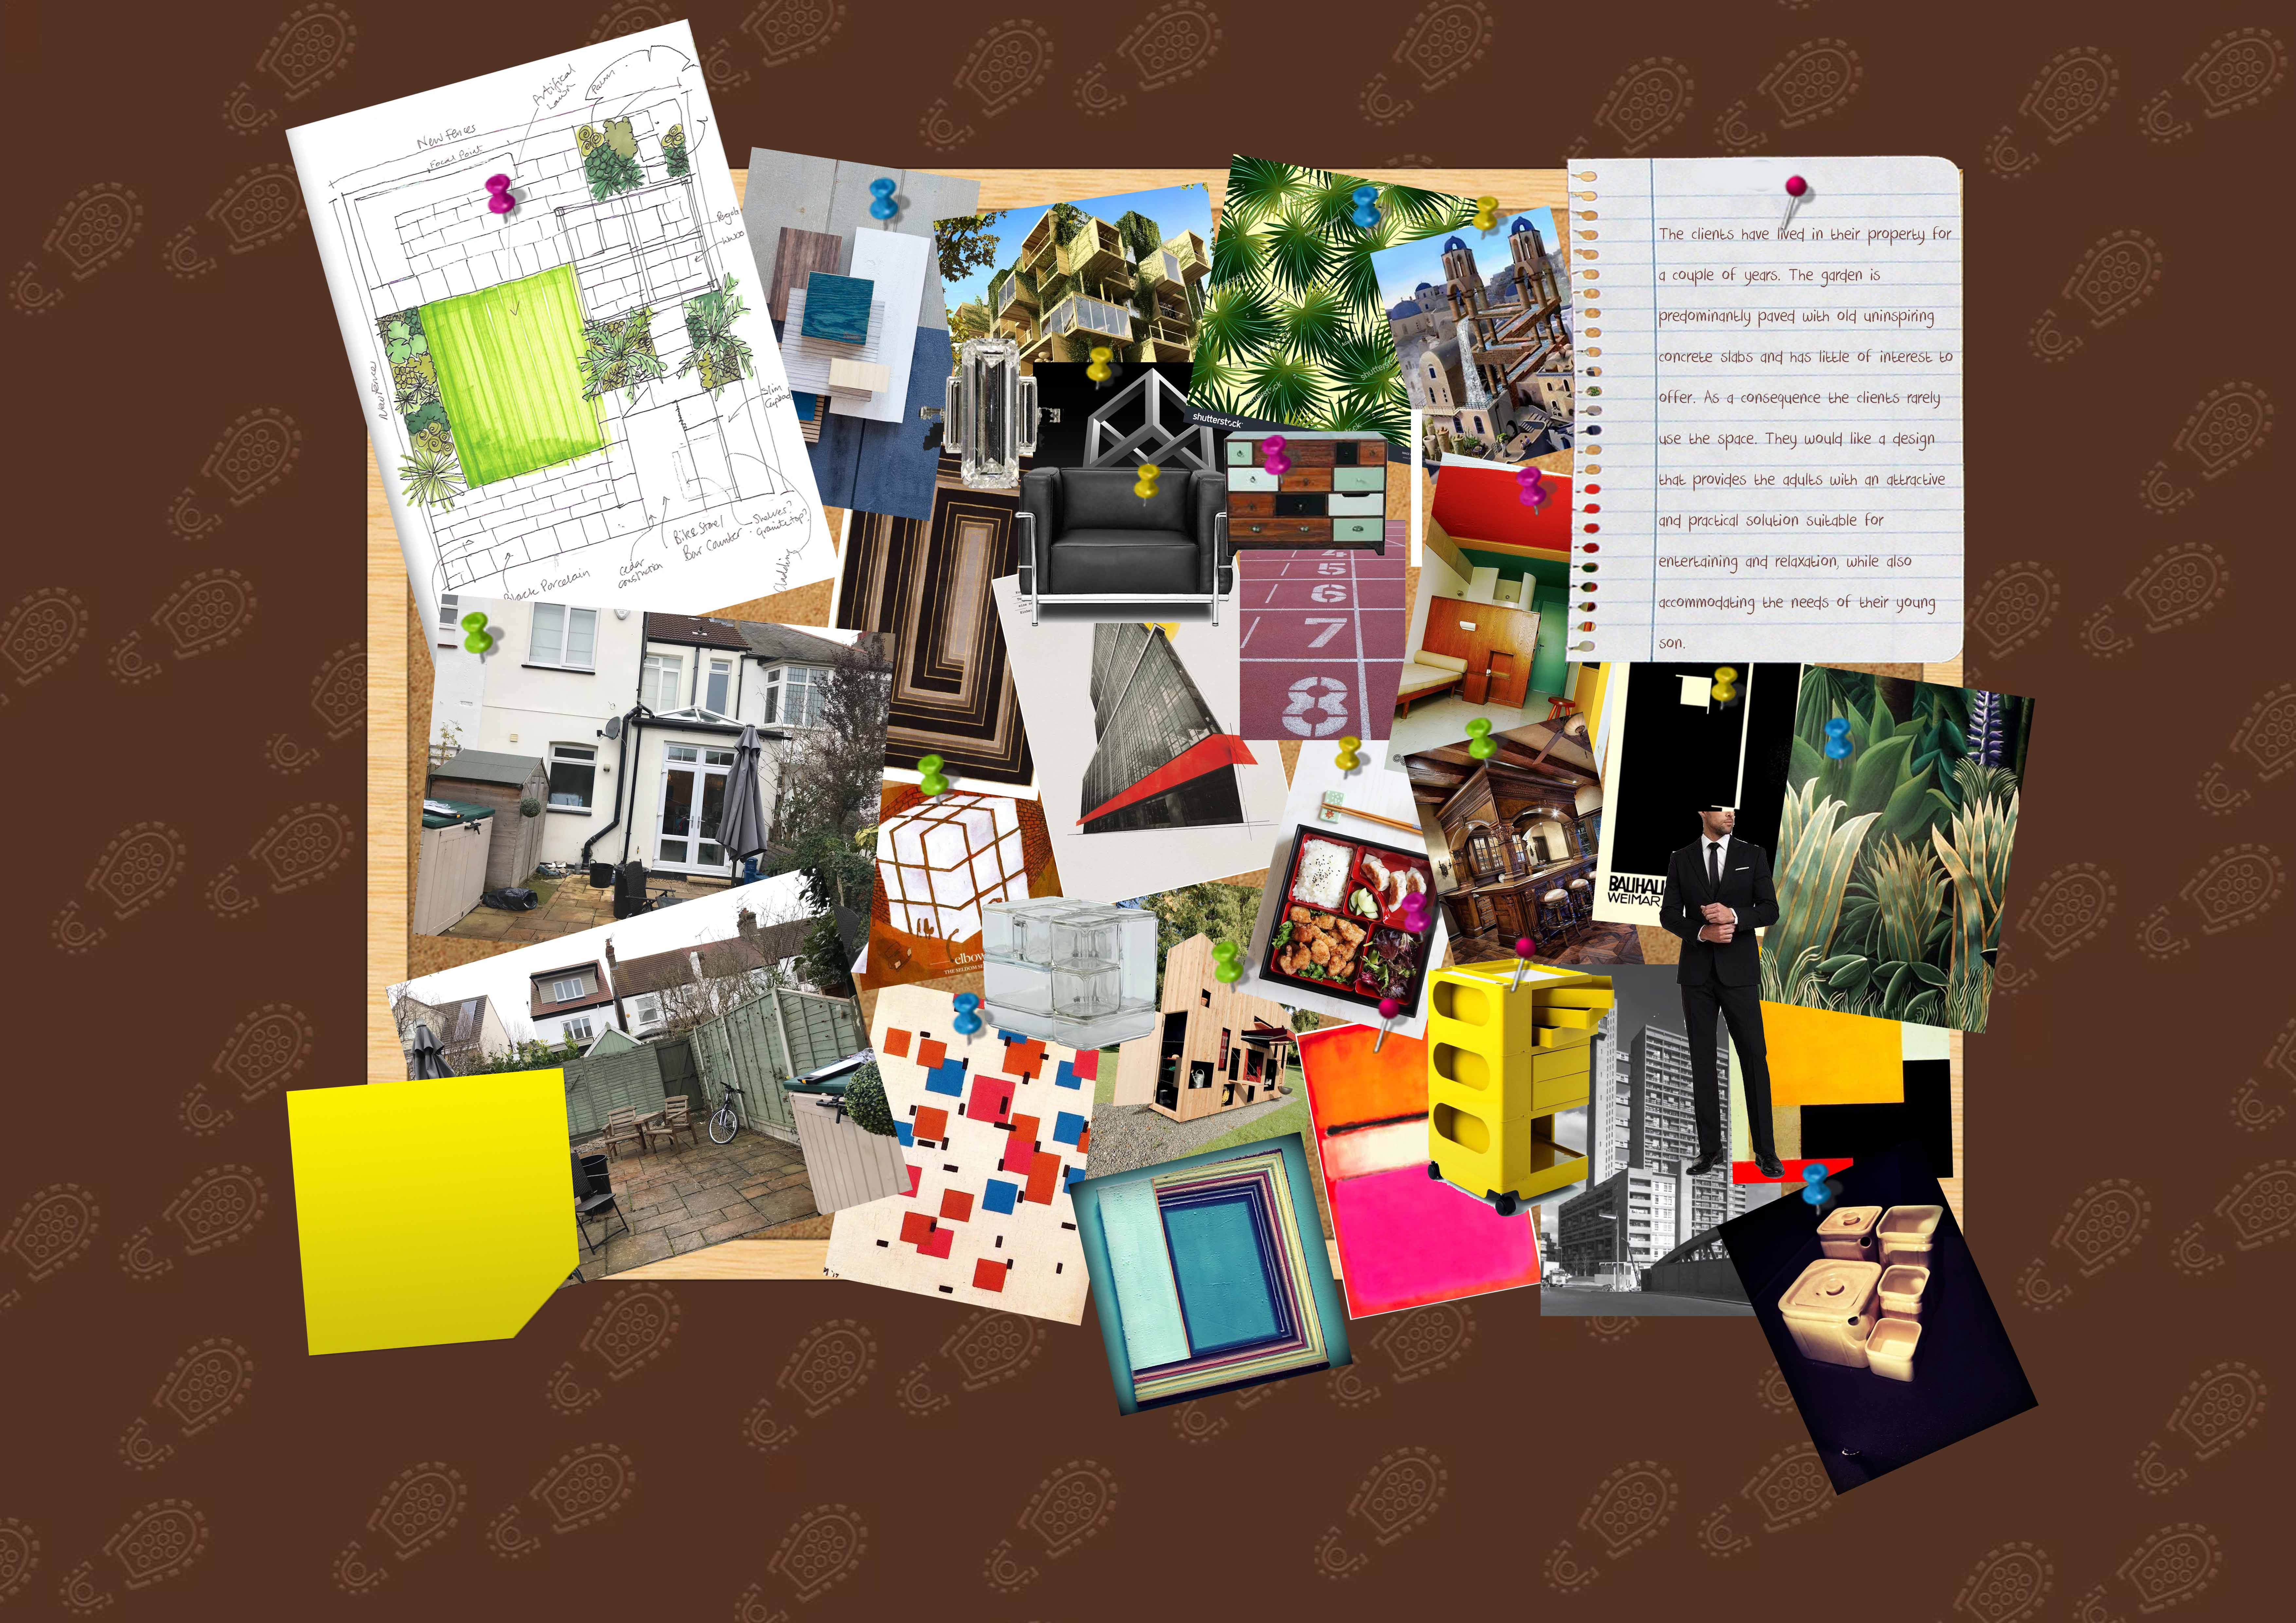 Earth Designs - moodboard for inspiring garden design